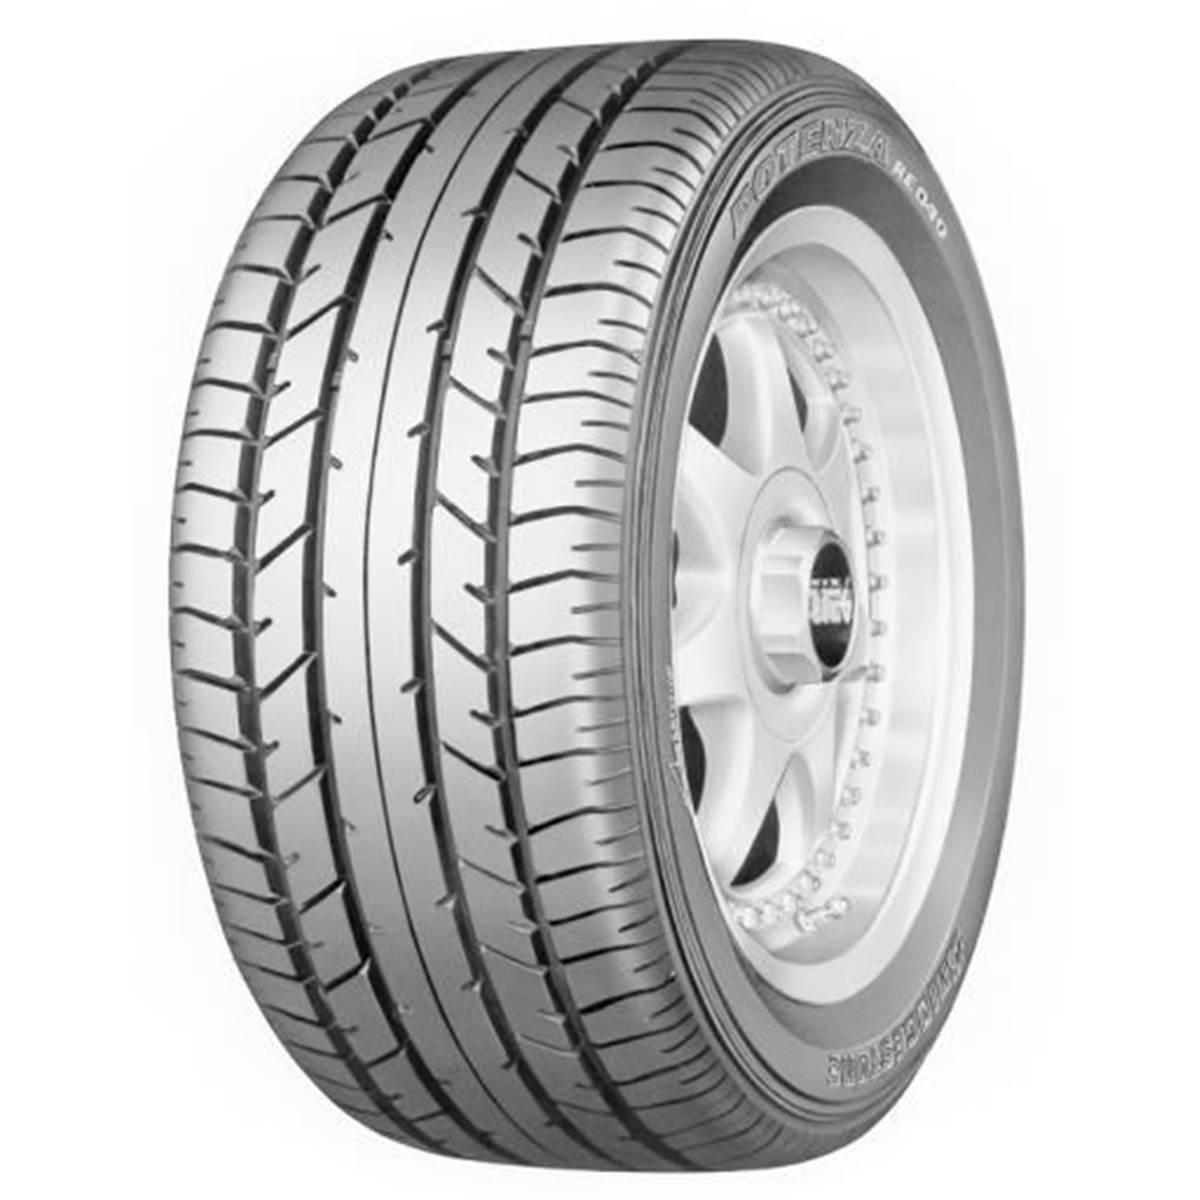 Pneu Bridgestone 215/45R17 87V Potenza Re040